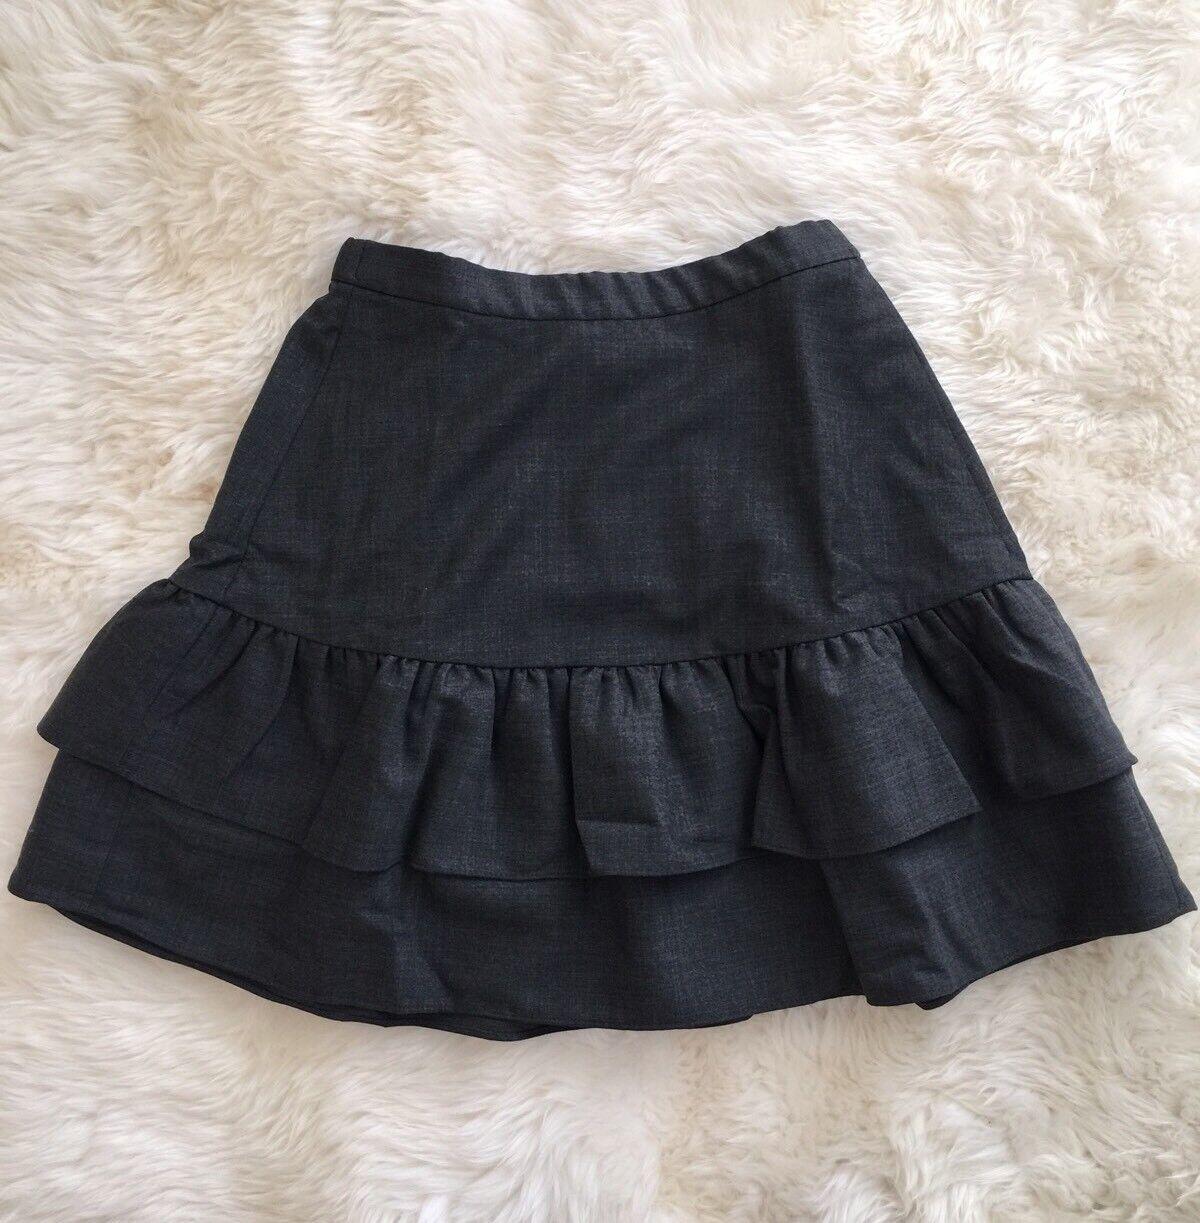 New J Crew Wool Flannel Ruffle Office Skirt Heather Charcoal Grey Sz 2 G7119